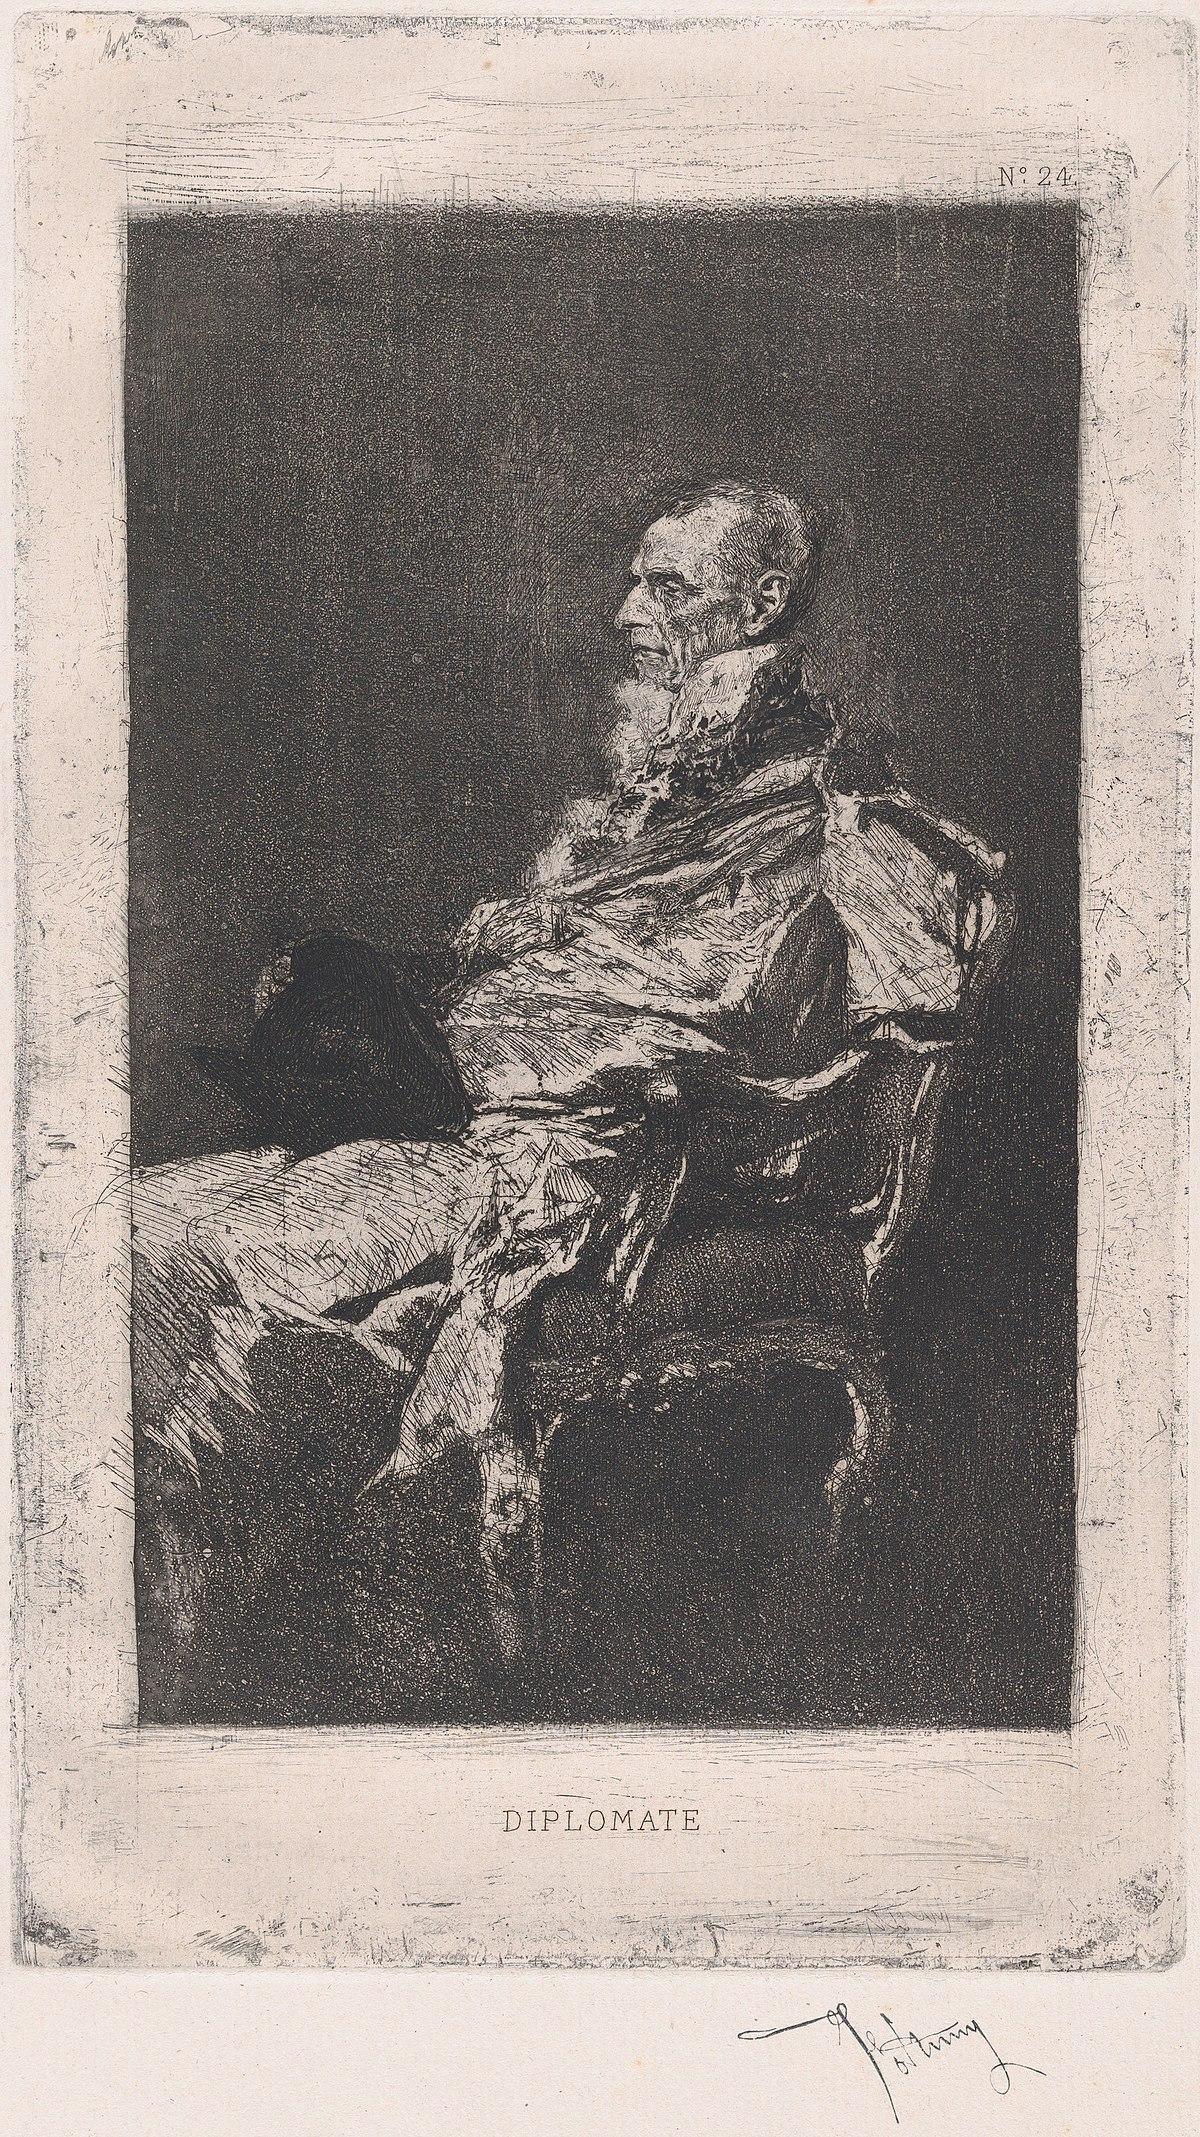 Diplomatman